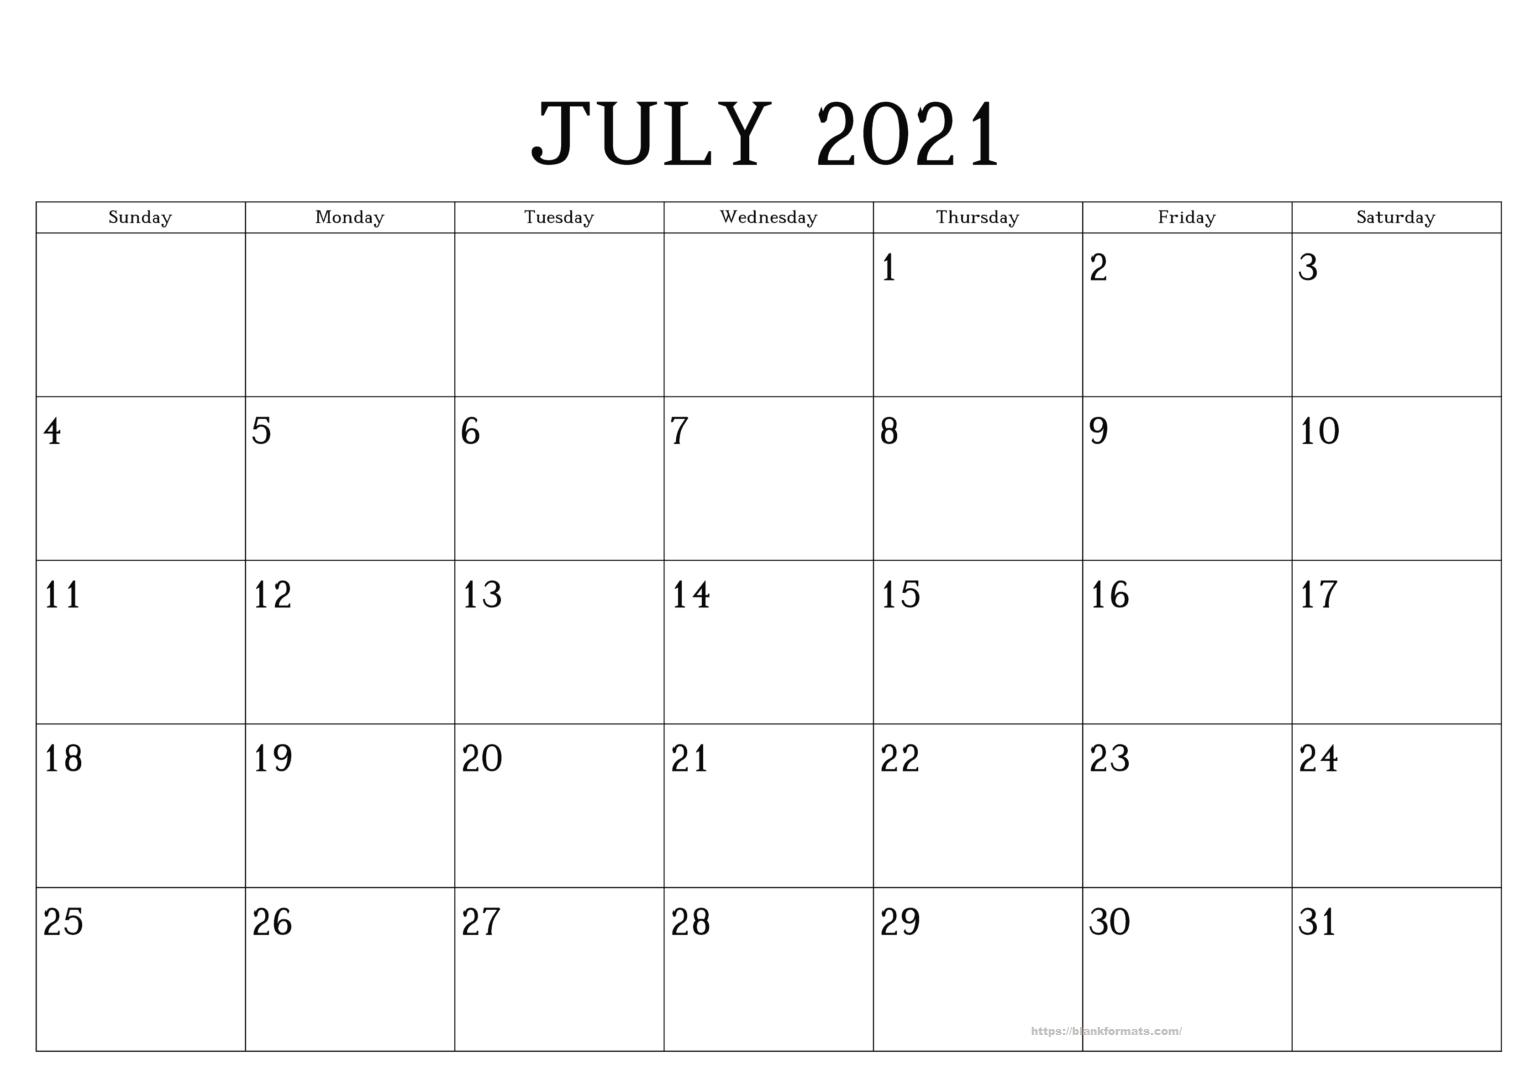 Blank July 2021 Calendar Printable Editable Reminder Editable July 2021 Calendar